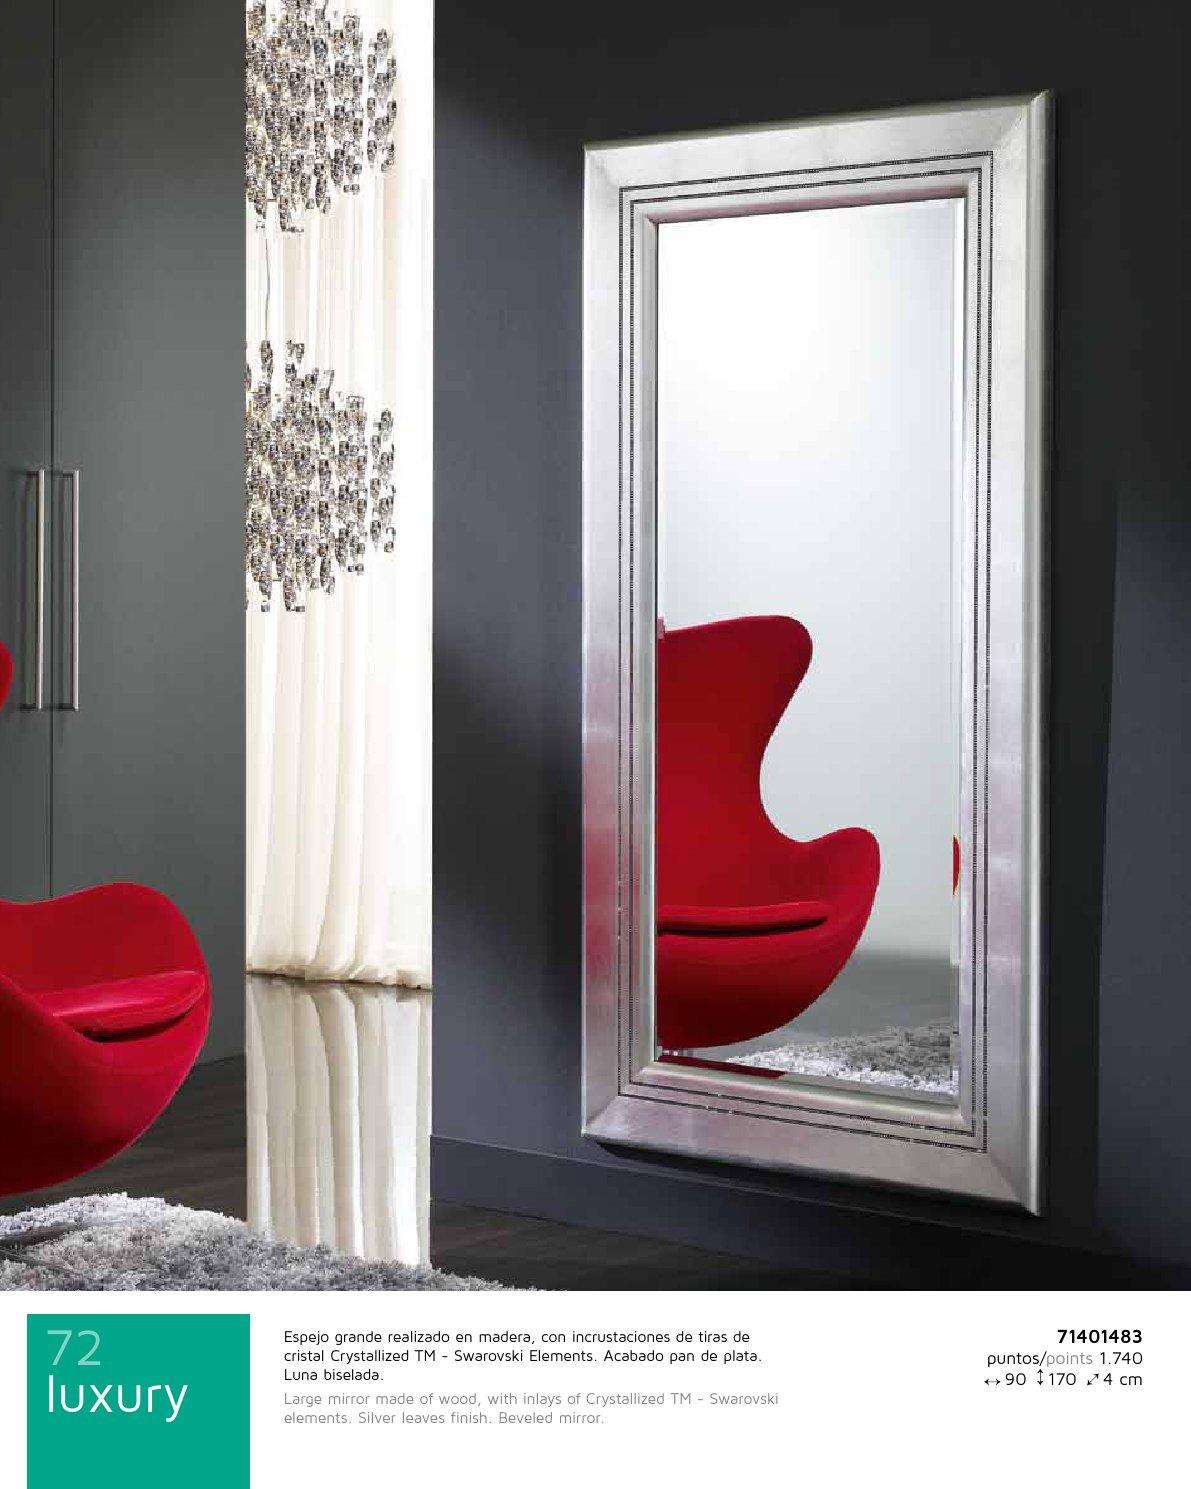 Schuller luxury espejo rectangular grande pan de 71401483 for Espejo rectangular grande